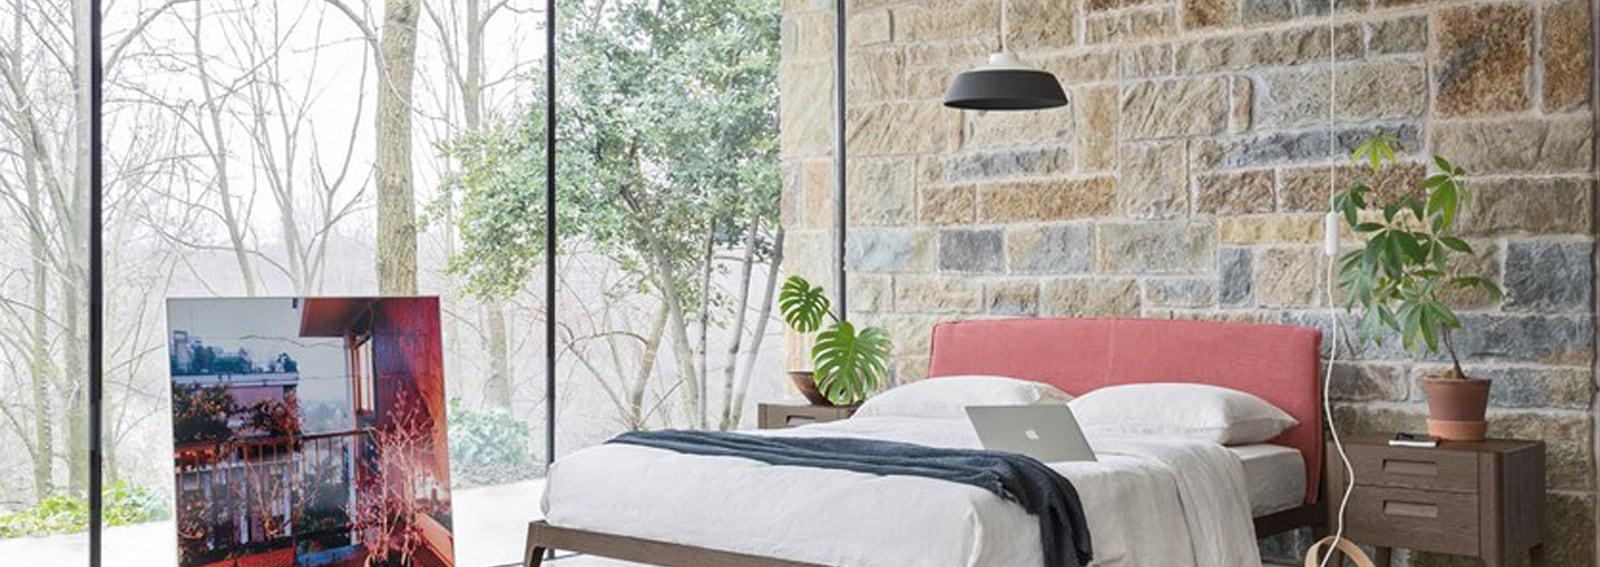 lampadario camera da letto desktop